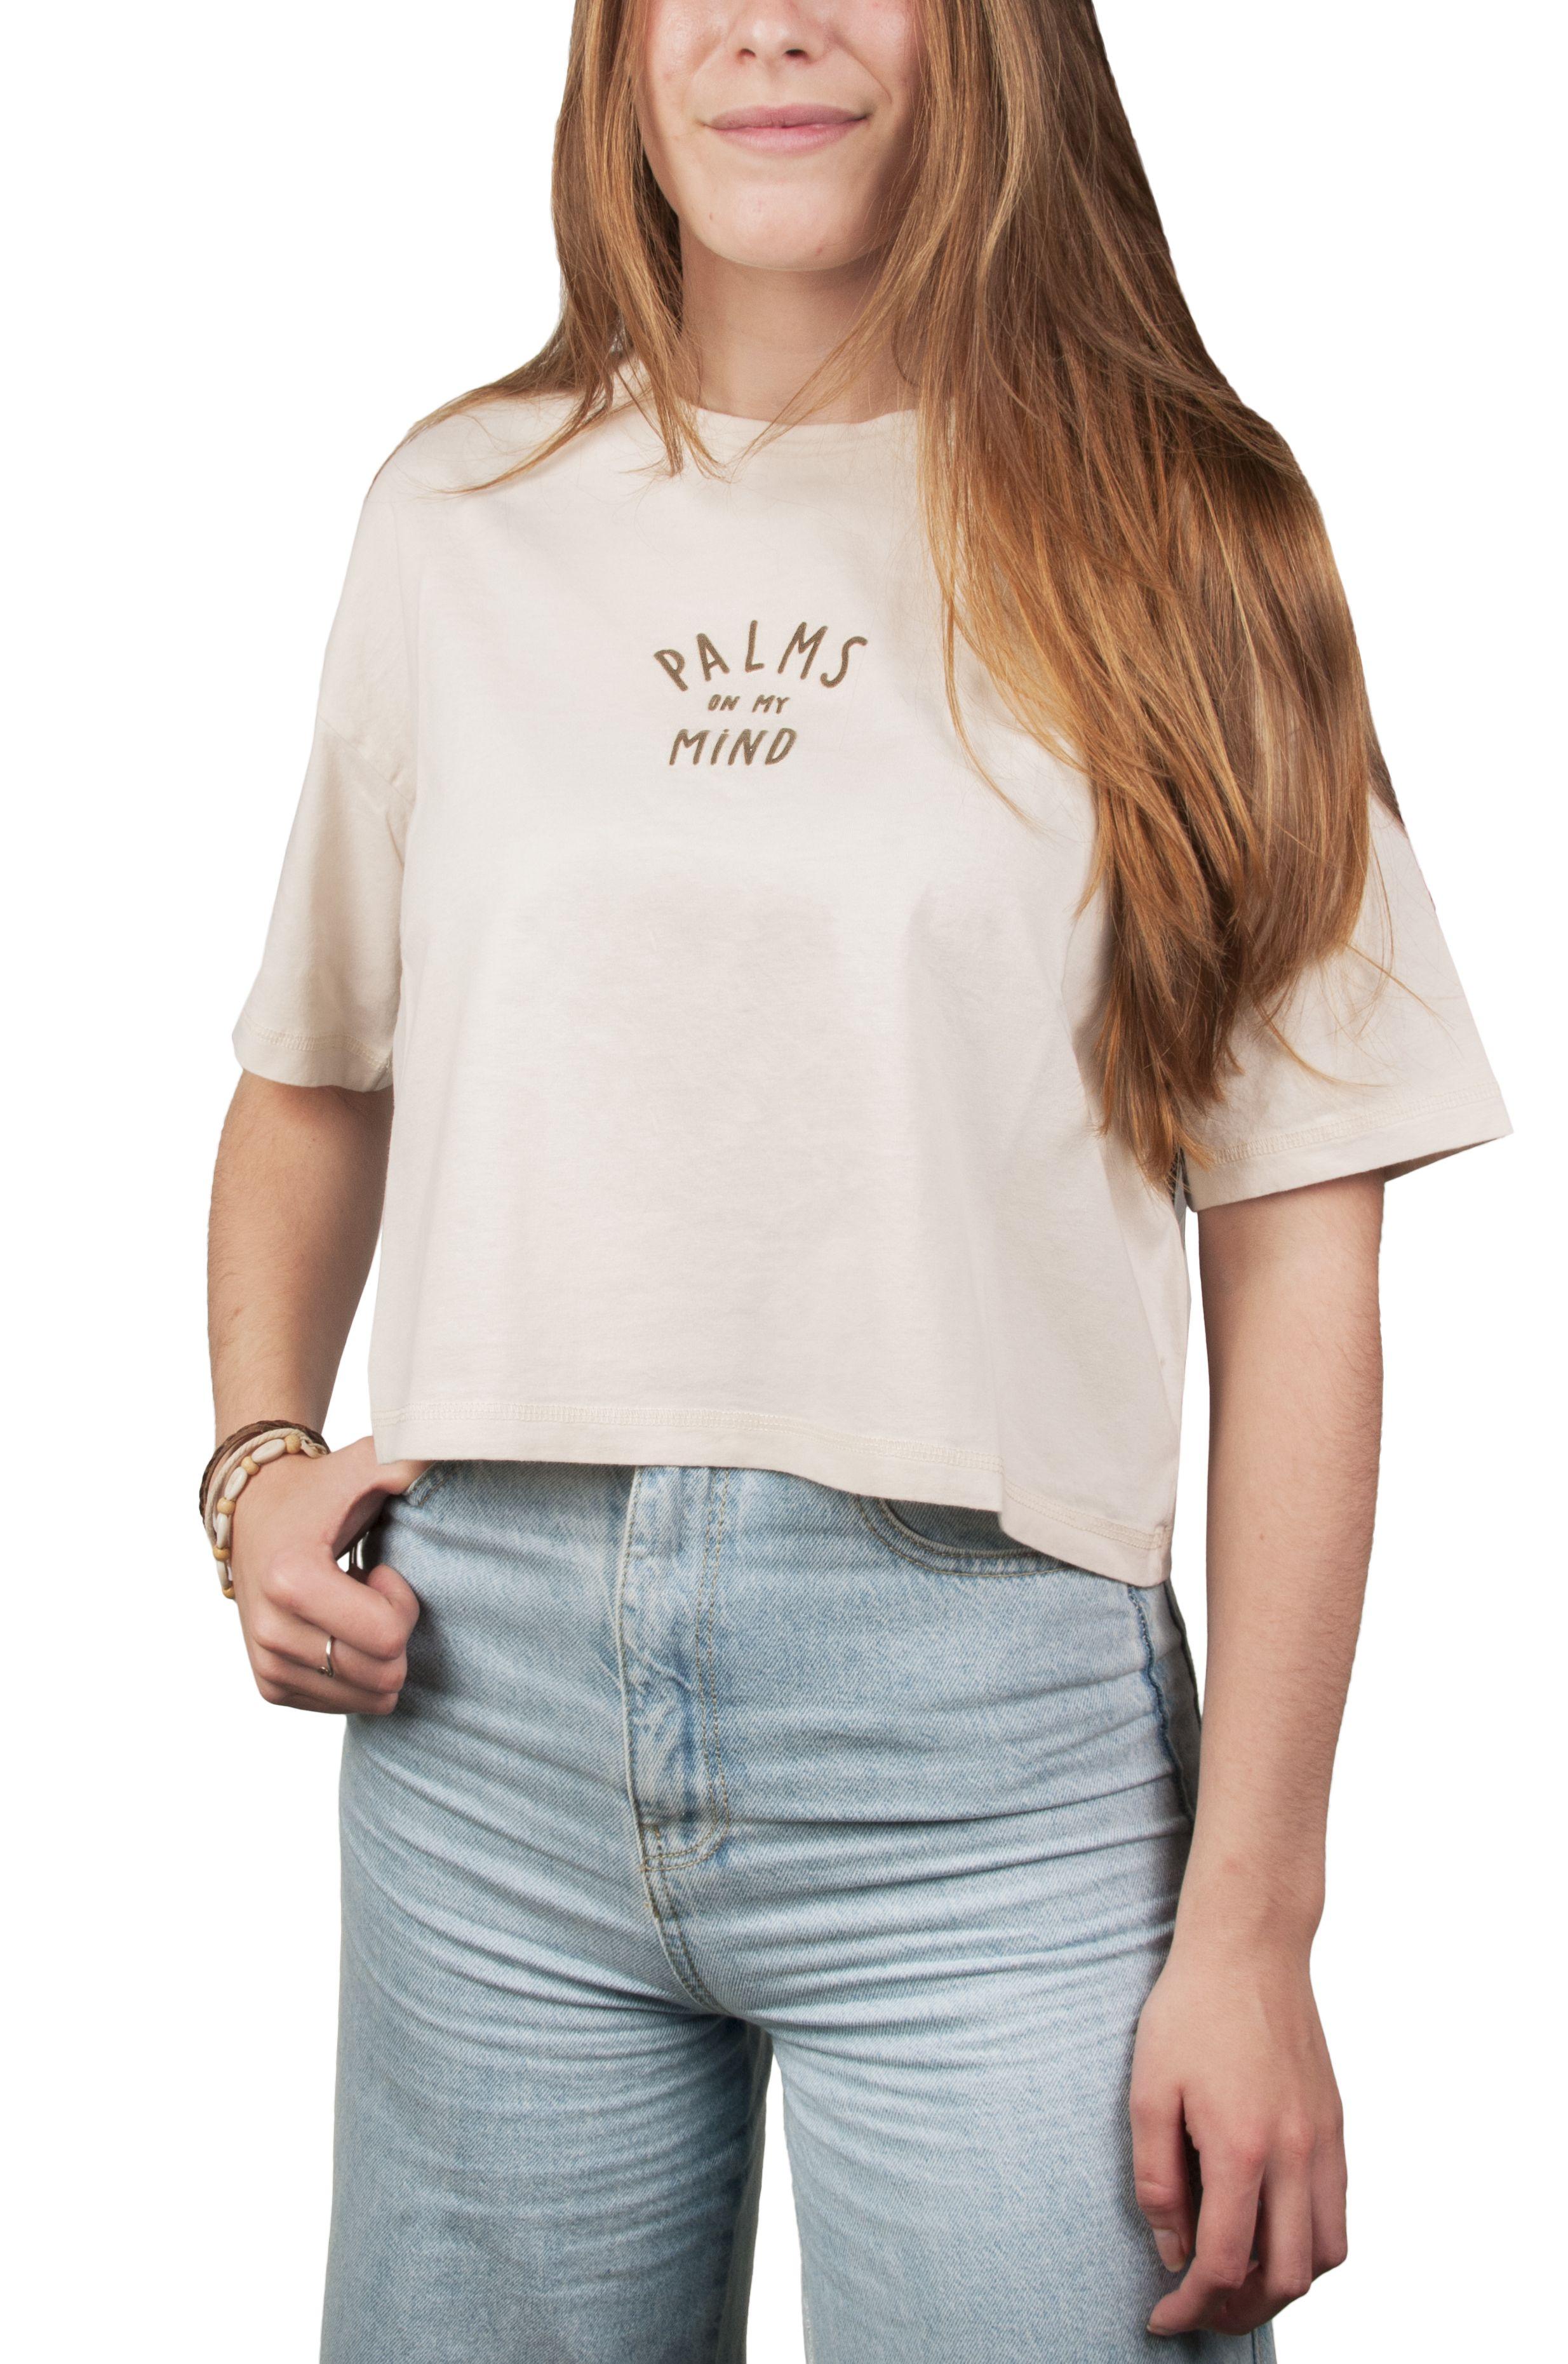 T-Shirt Ericeira Surf Skate SOL Cream